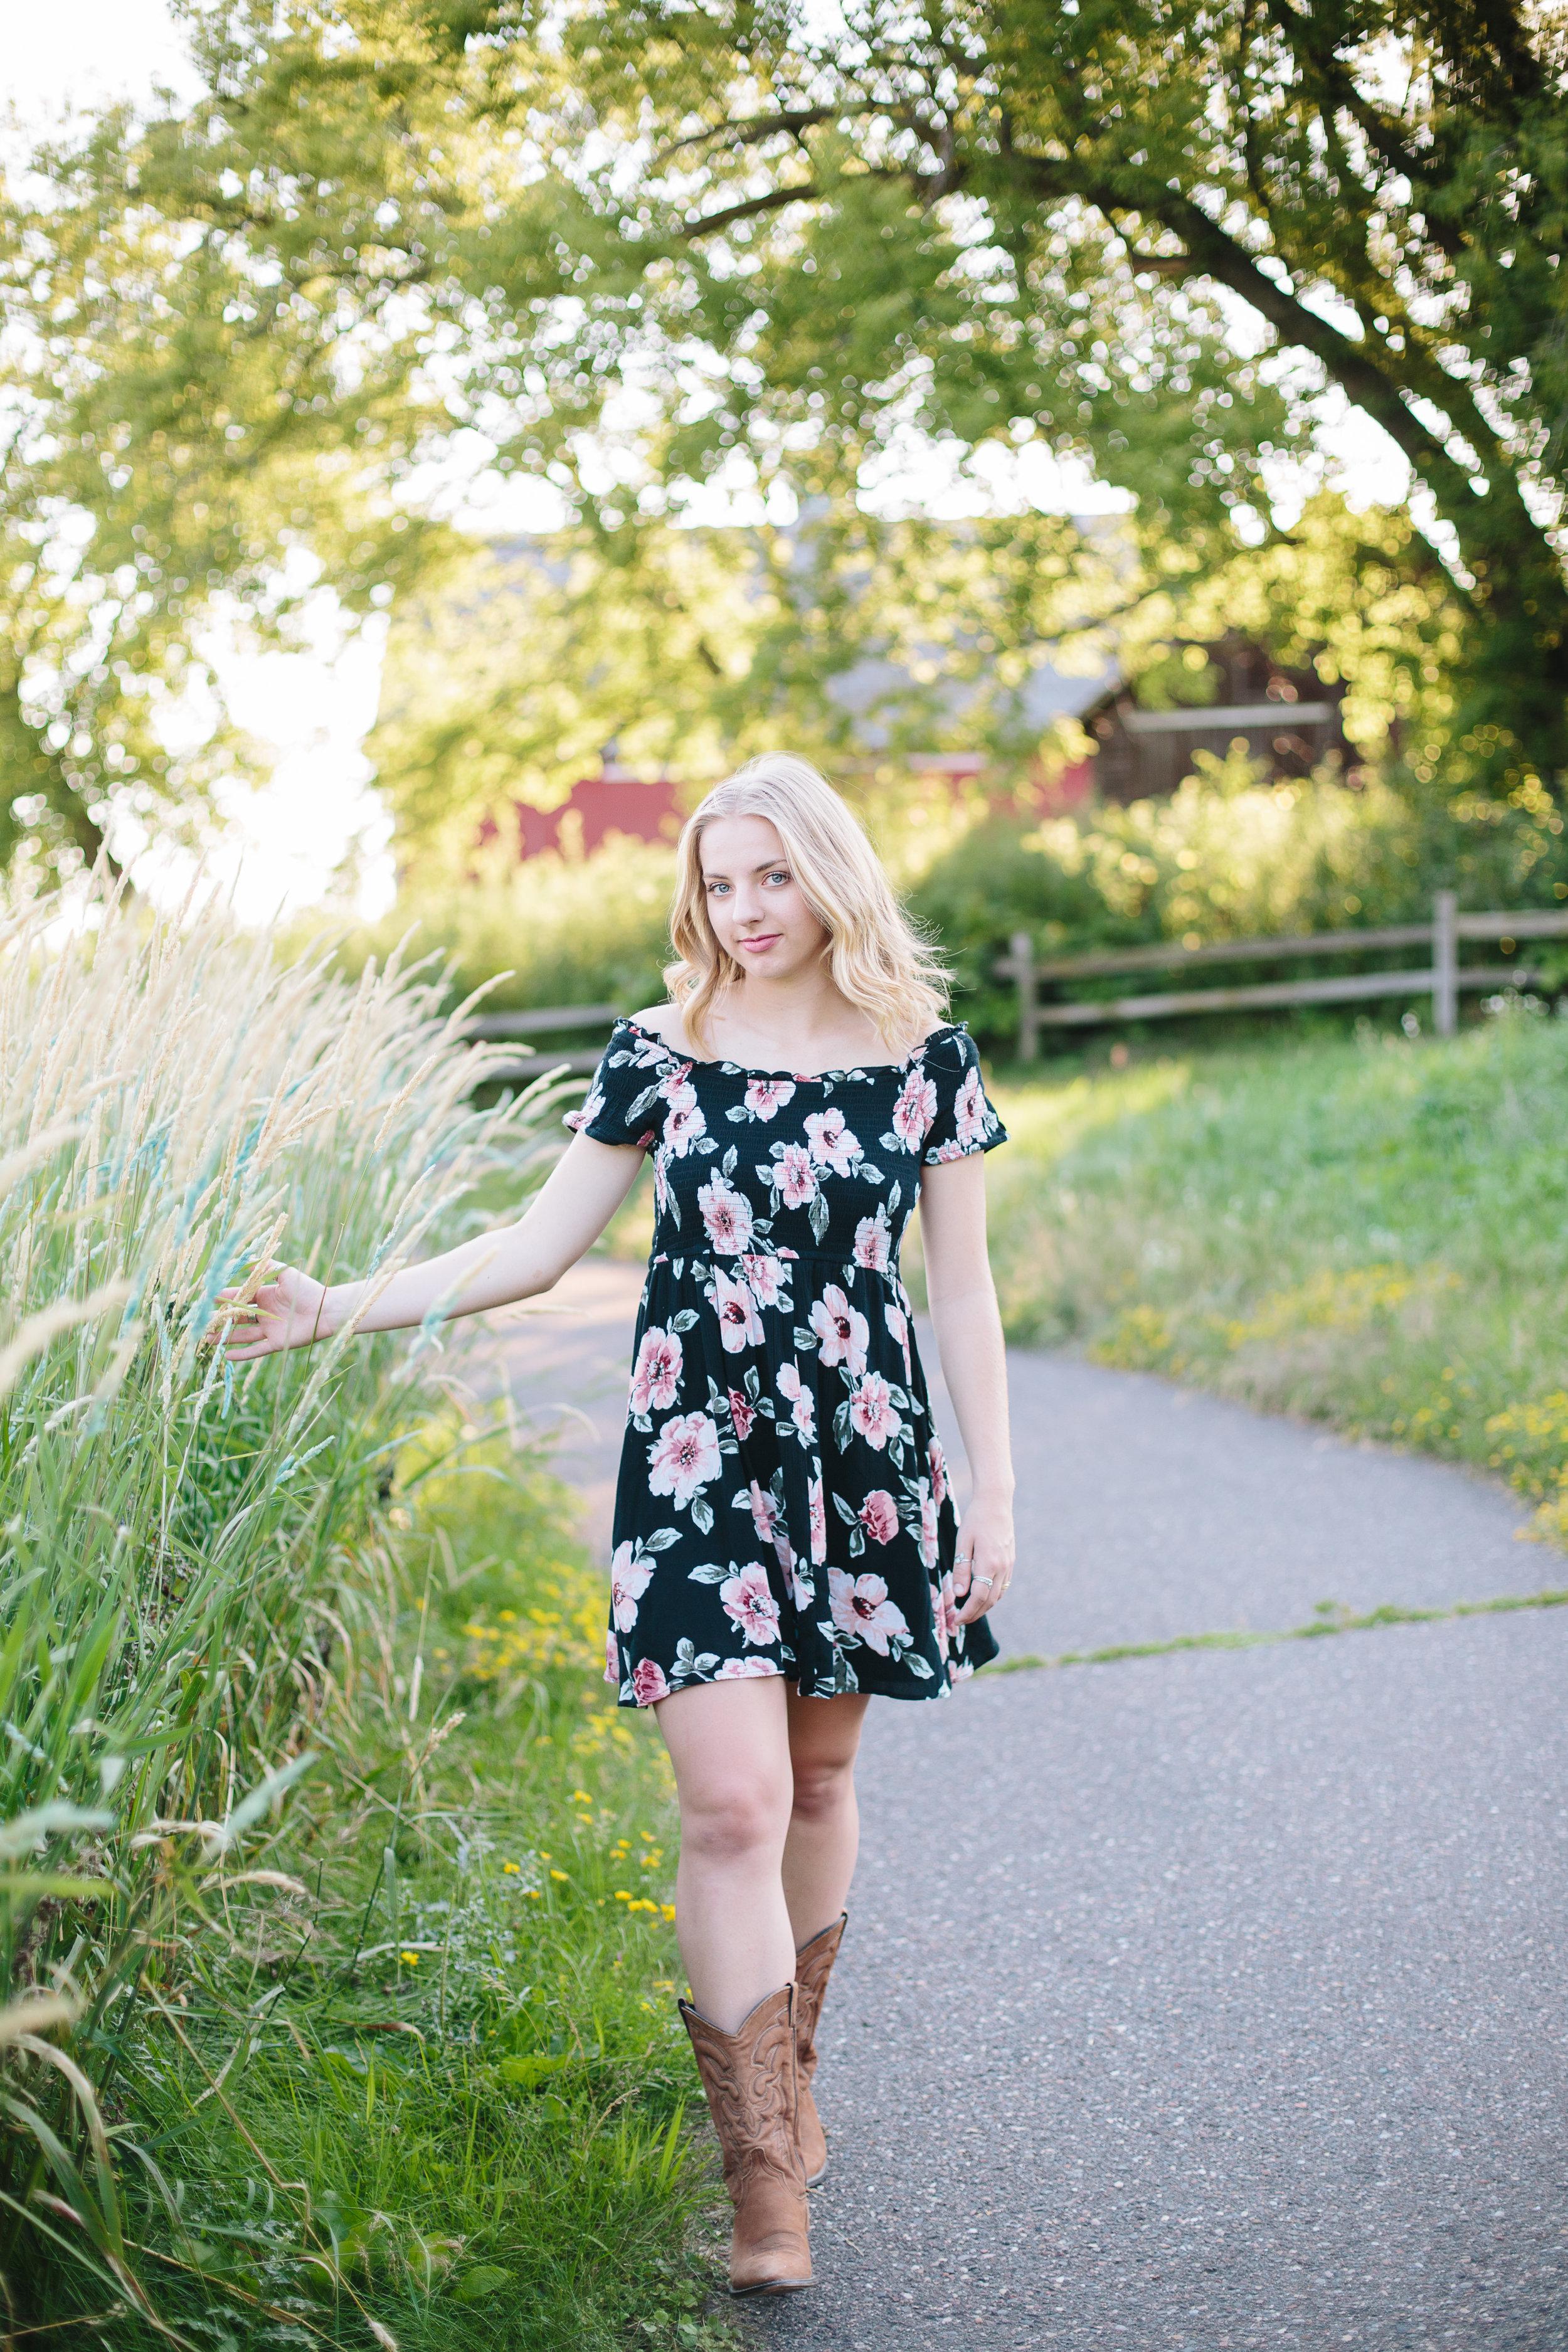 Lauren Baker Photography senior photo girl Chisago high school